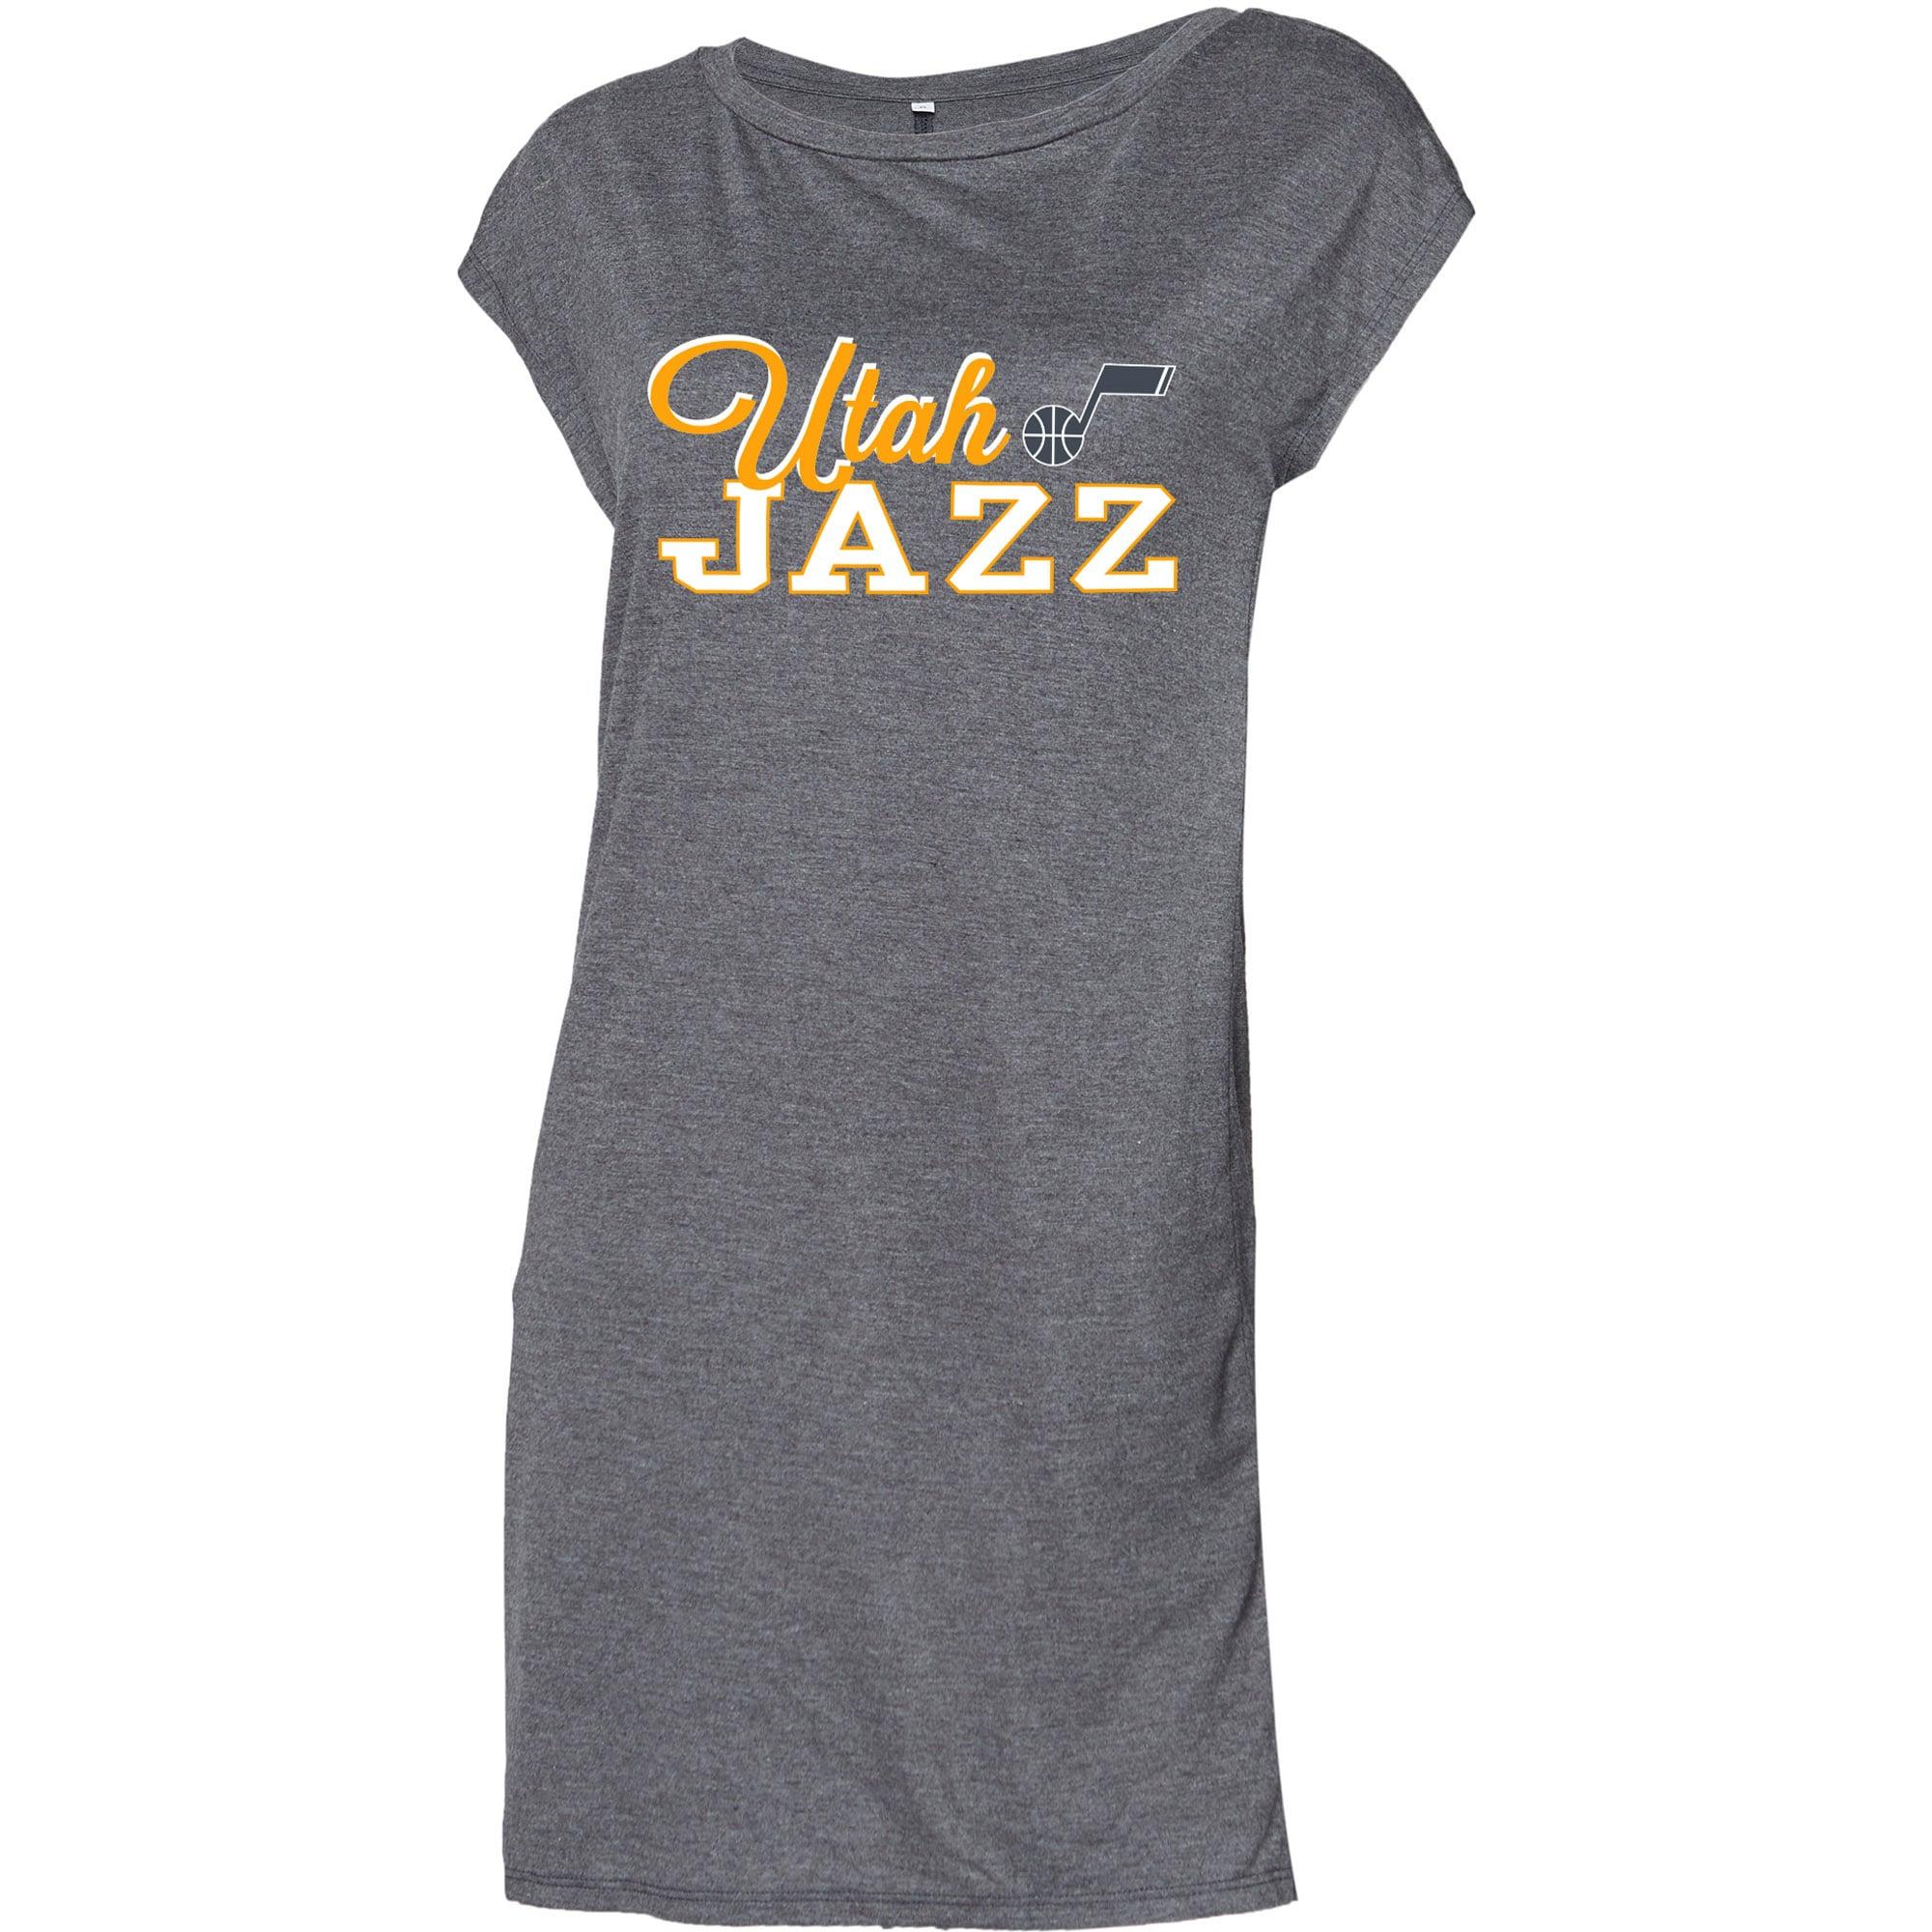 Utah Jazz Concepts Sport Women's Cascade Nightshirt - Heathered Charcoal